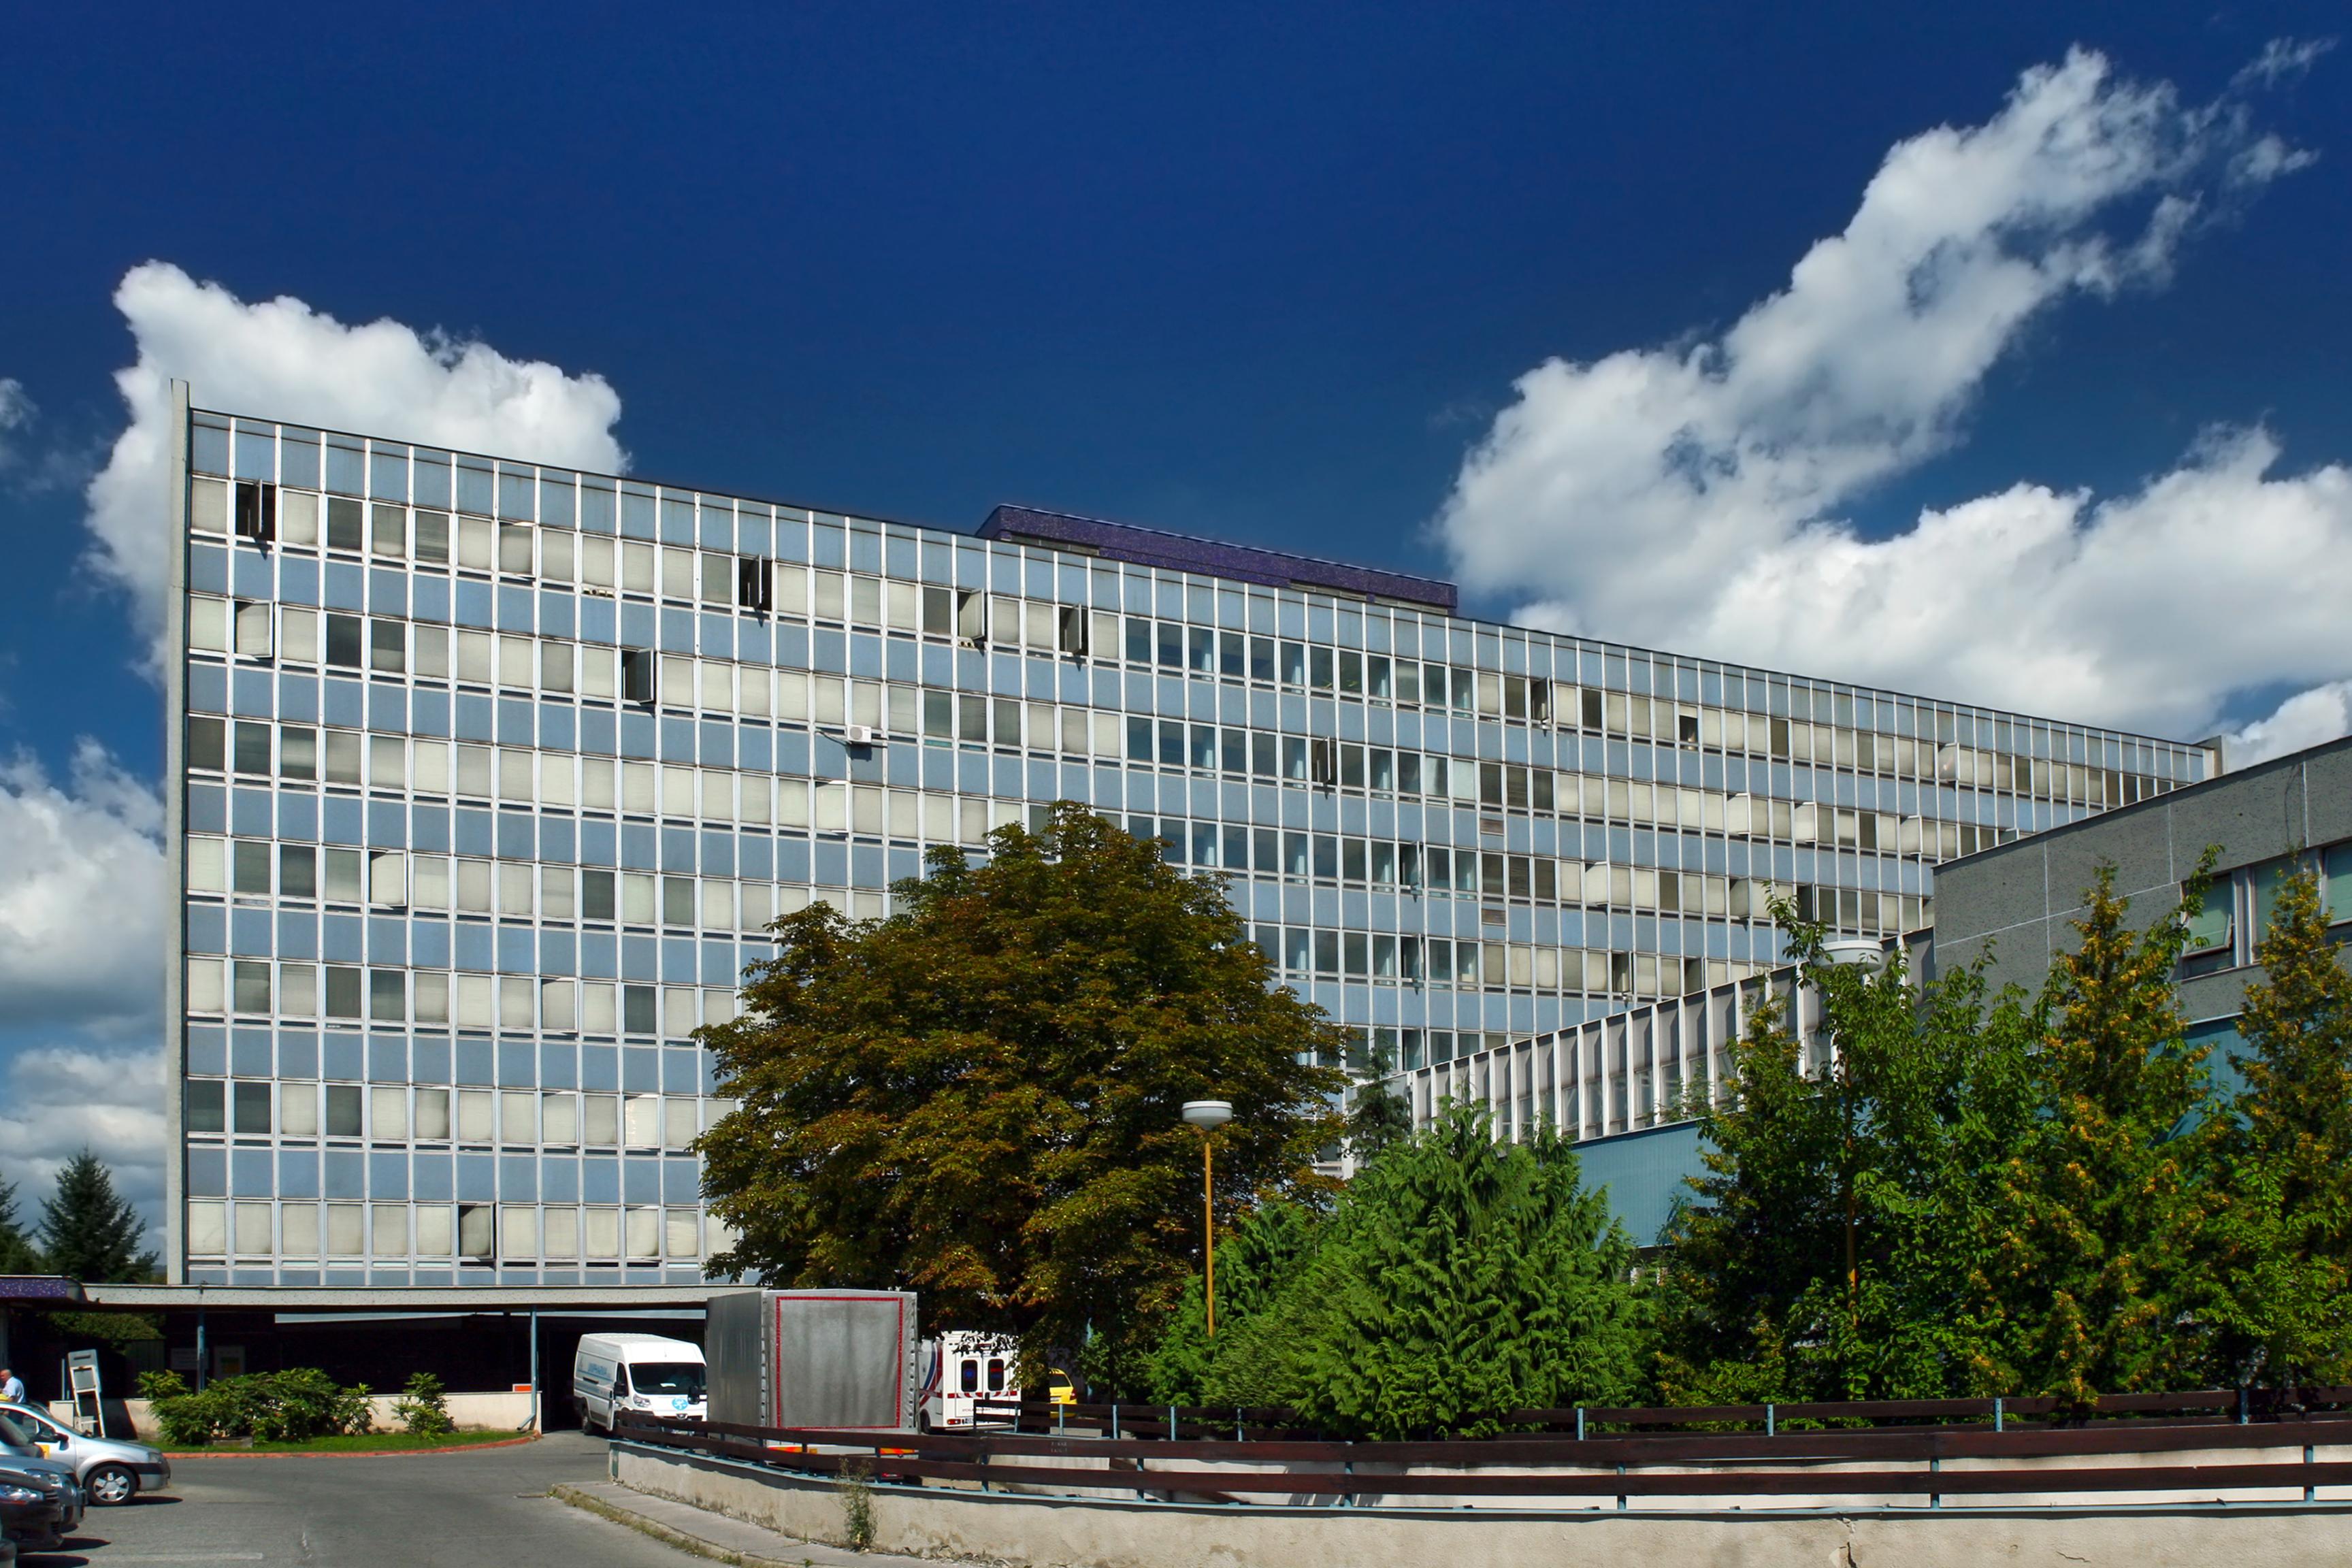 Louis Pasteur University Hospital, Košice, Slovakia